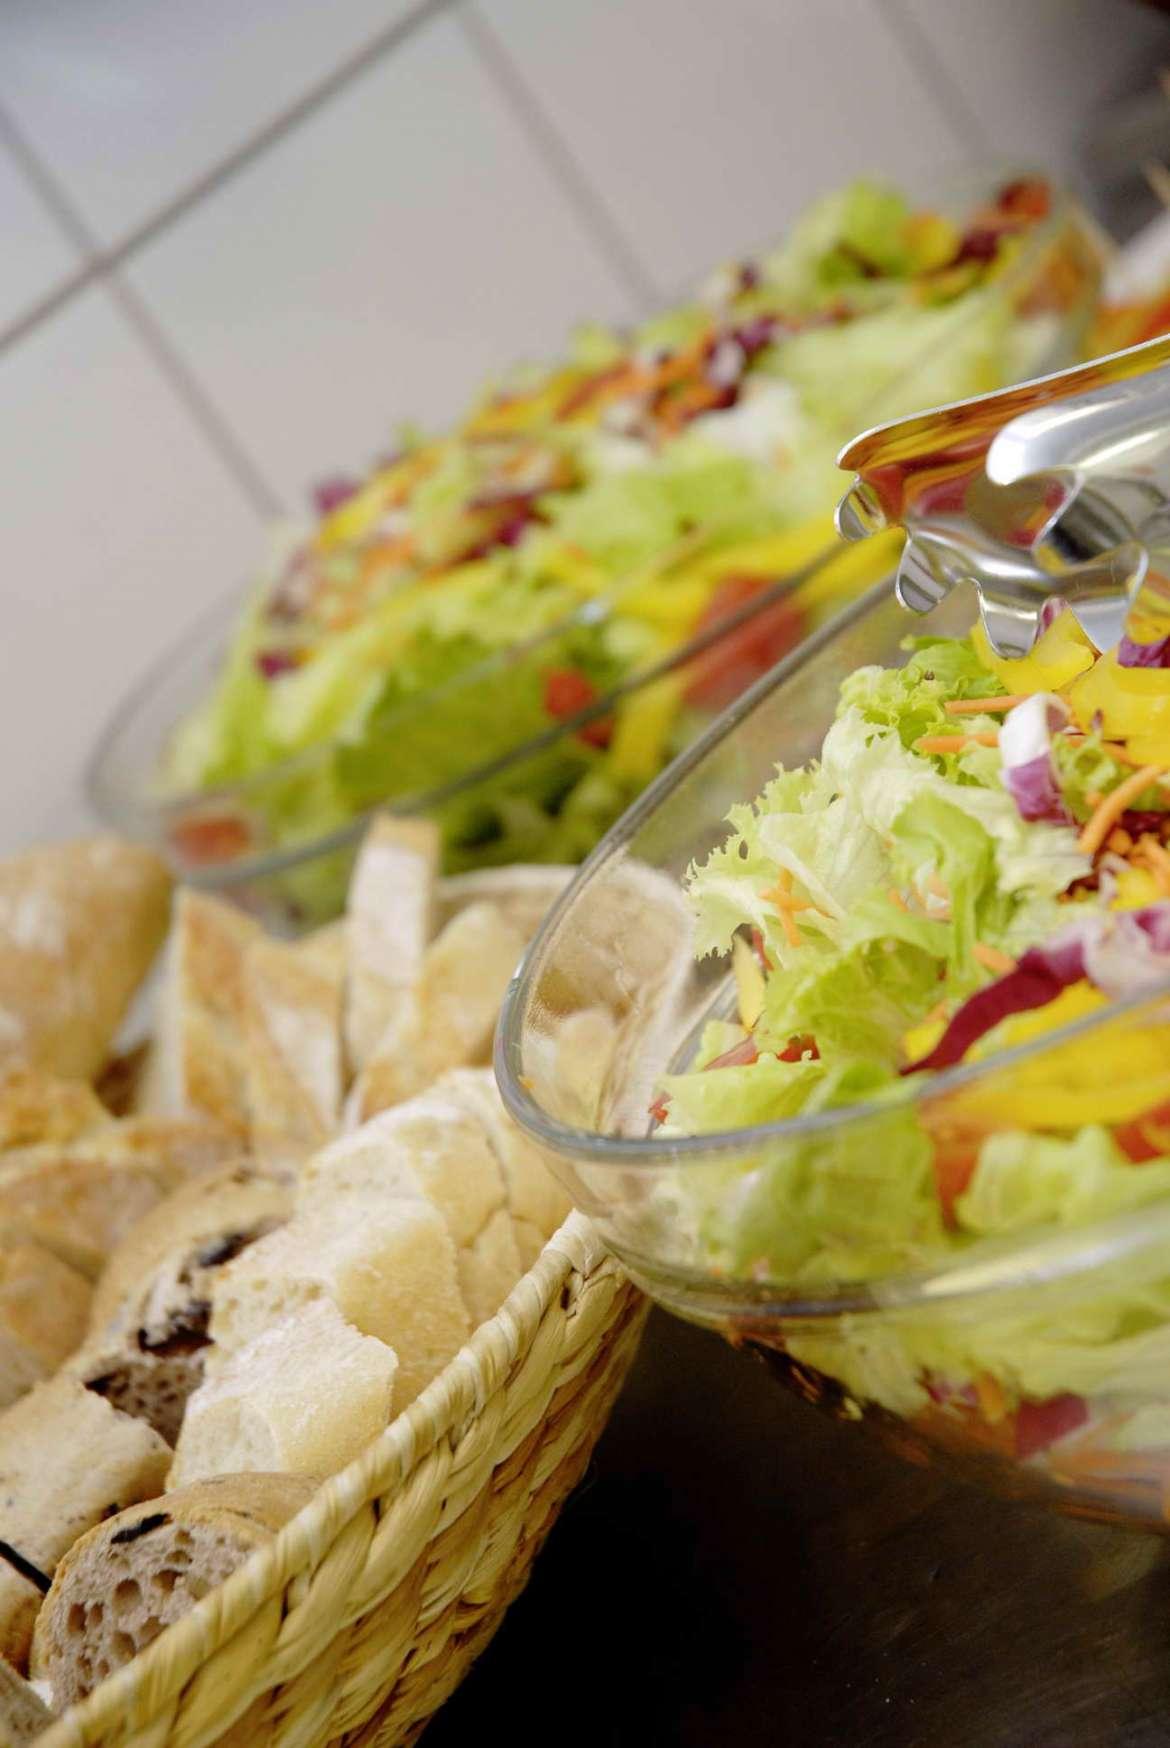 Bildergalerie-Fingerfood-warme-Speisen-17.jpg